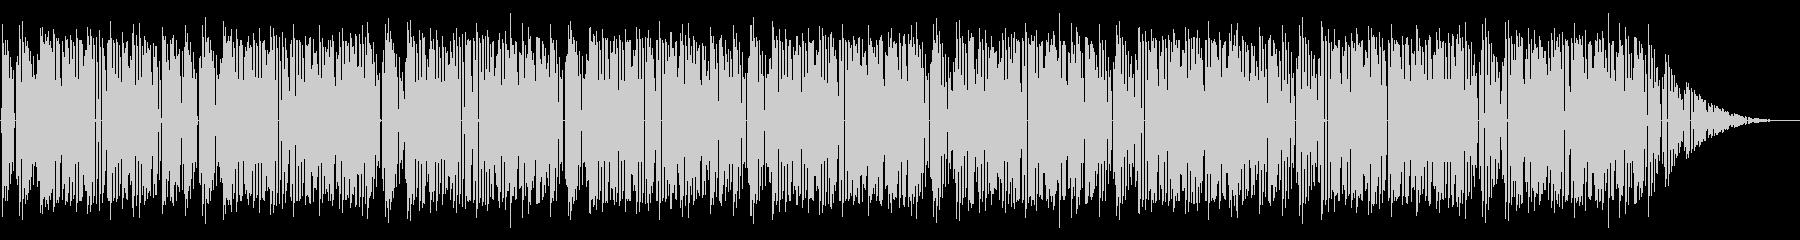 NES レース A03-1(ステージ2)の未再生の波形